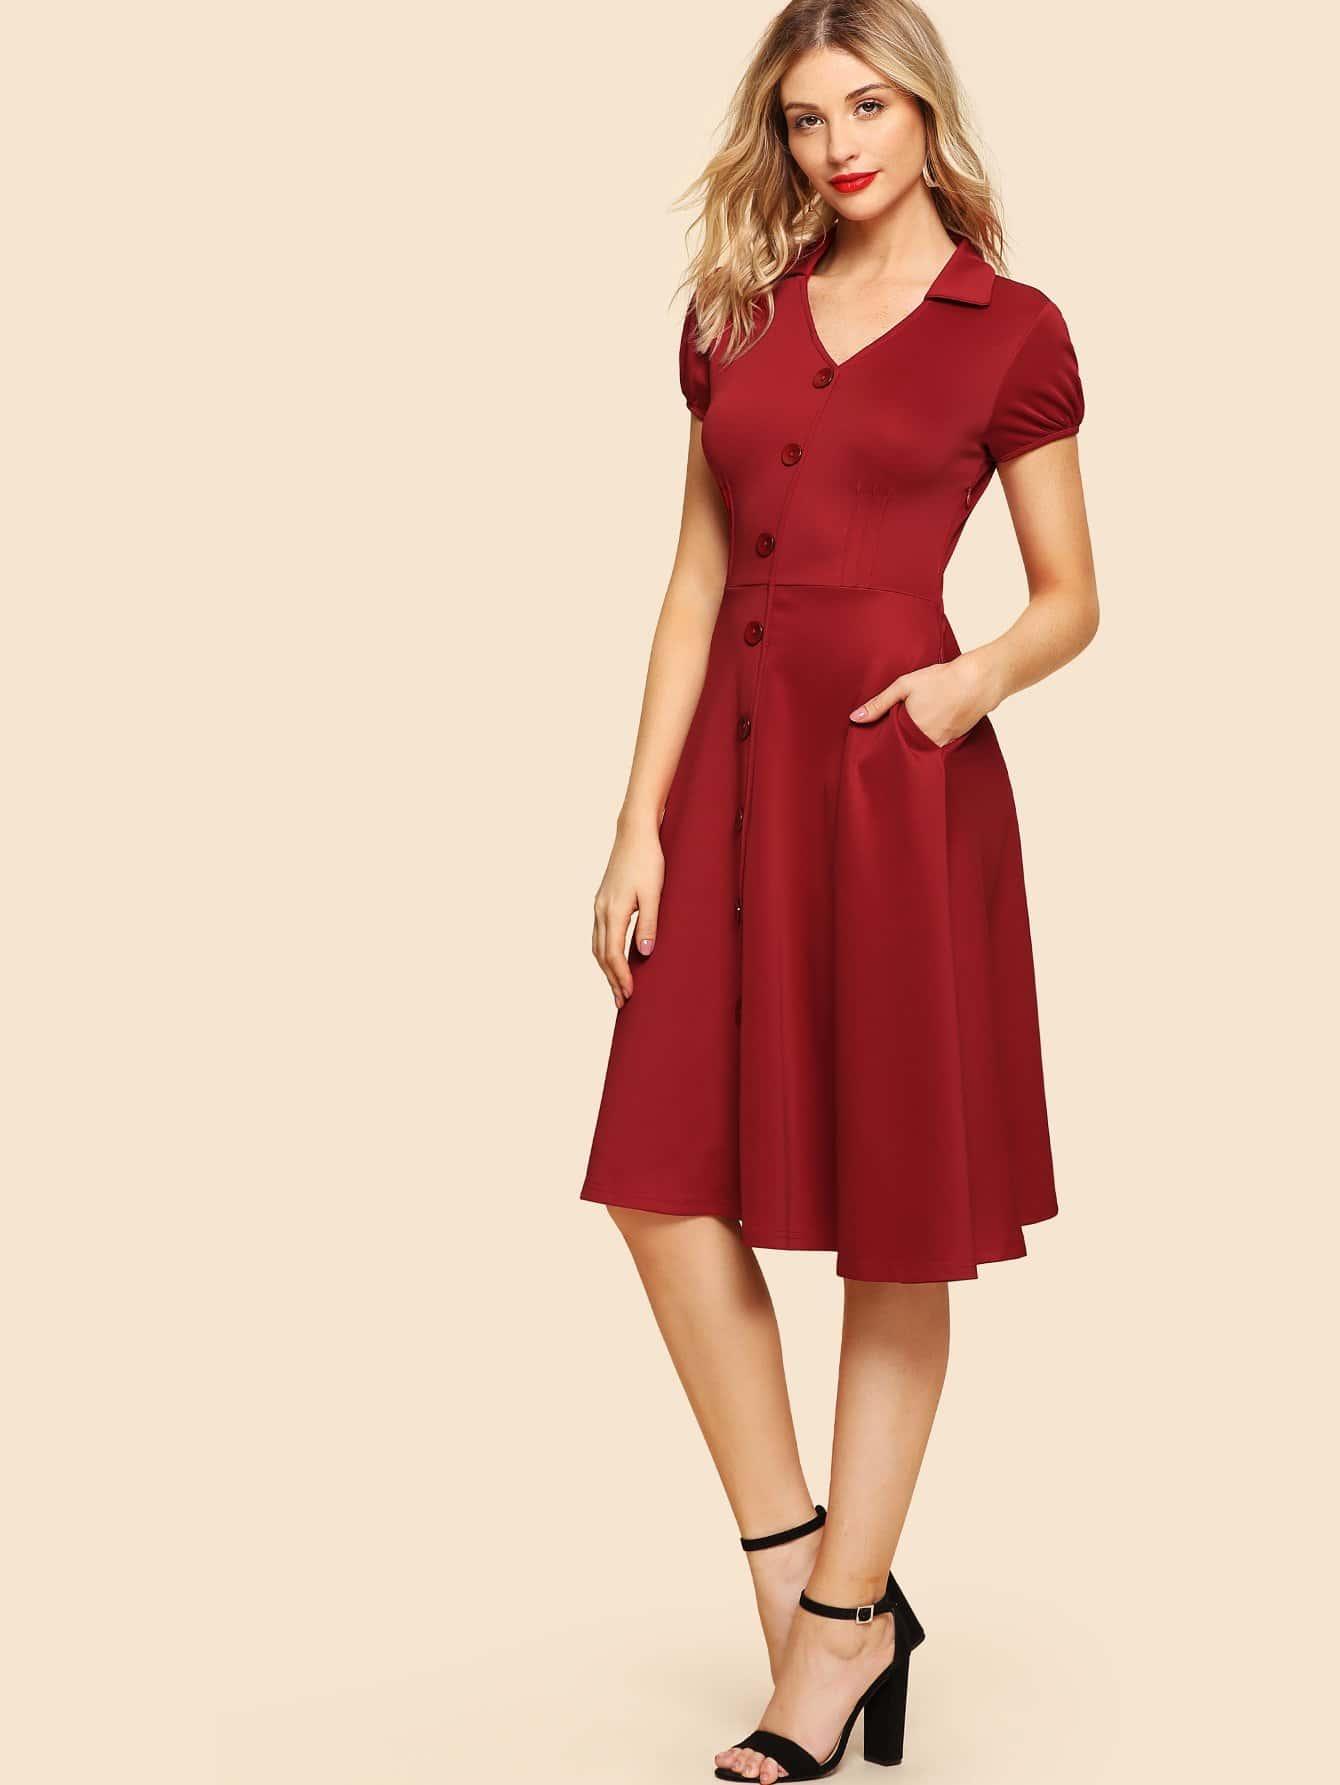 Single Breasted Front Solid Dress все цены